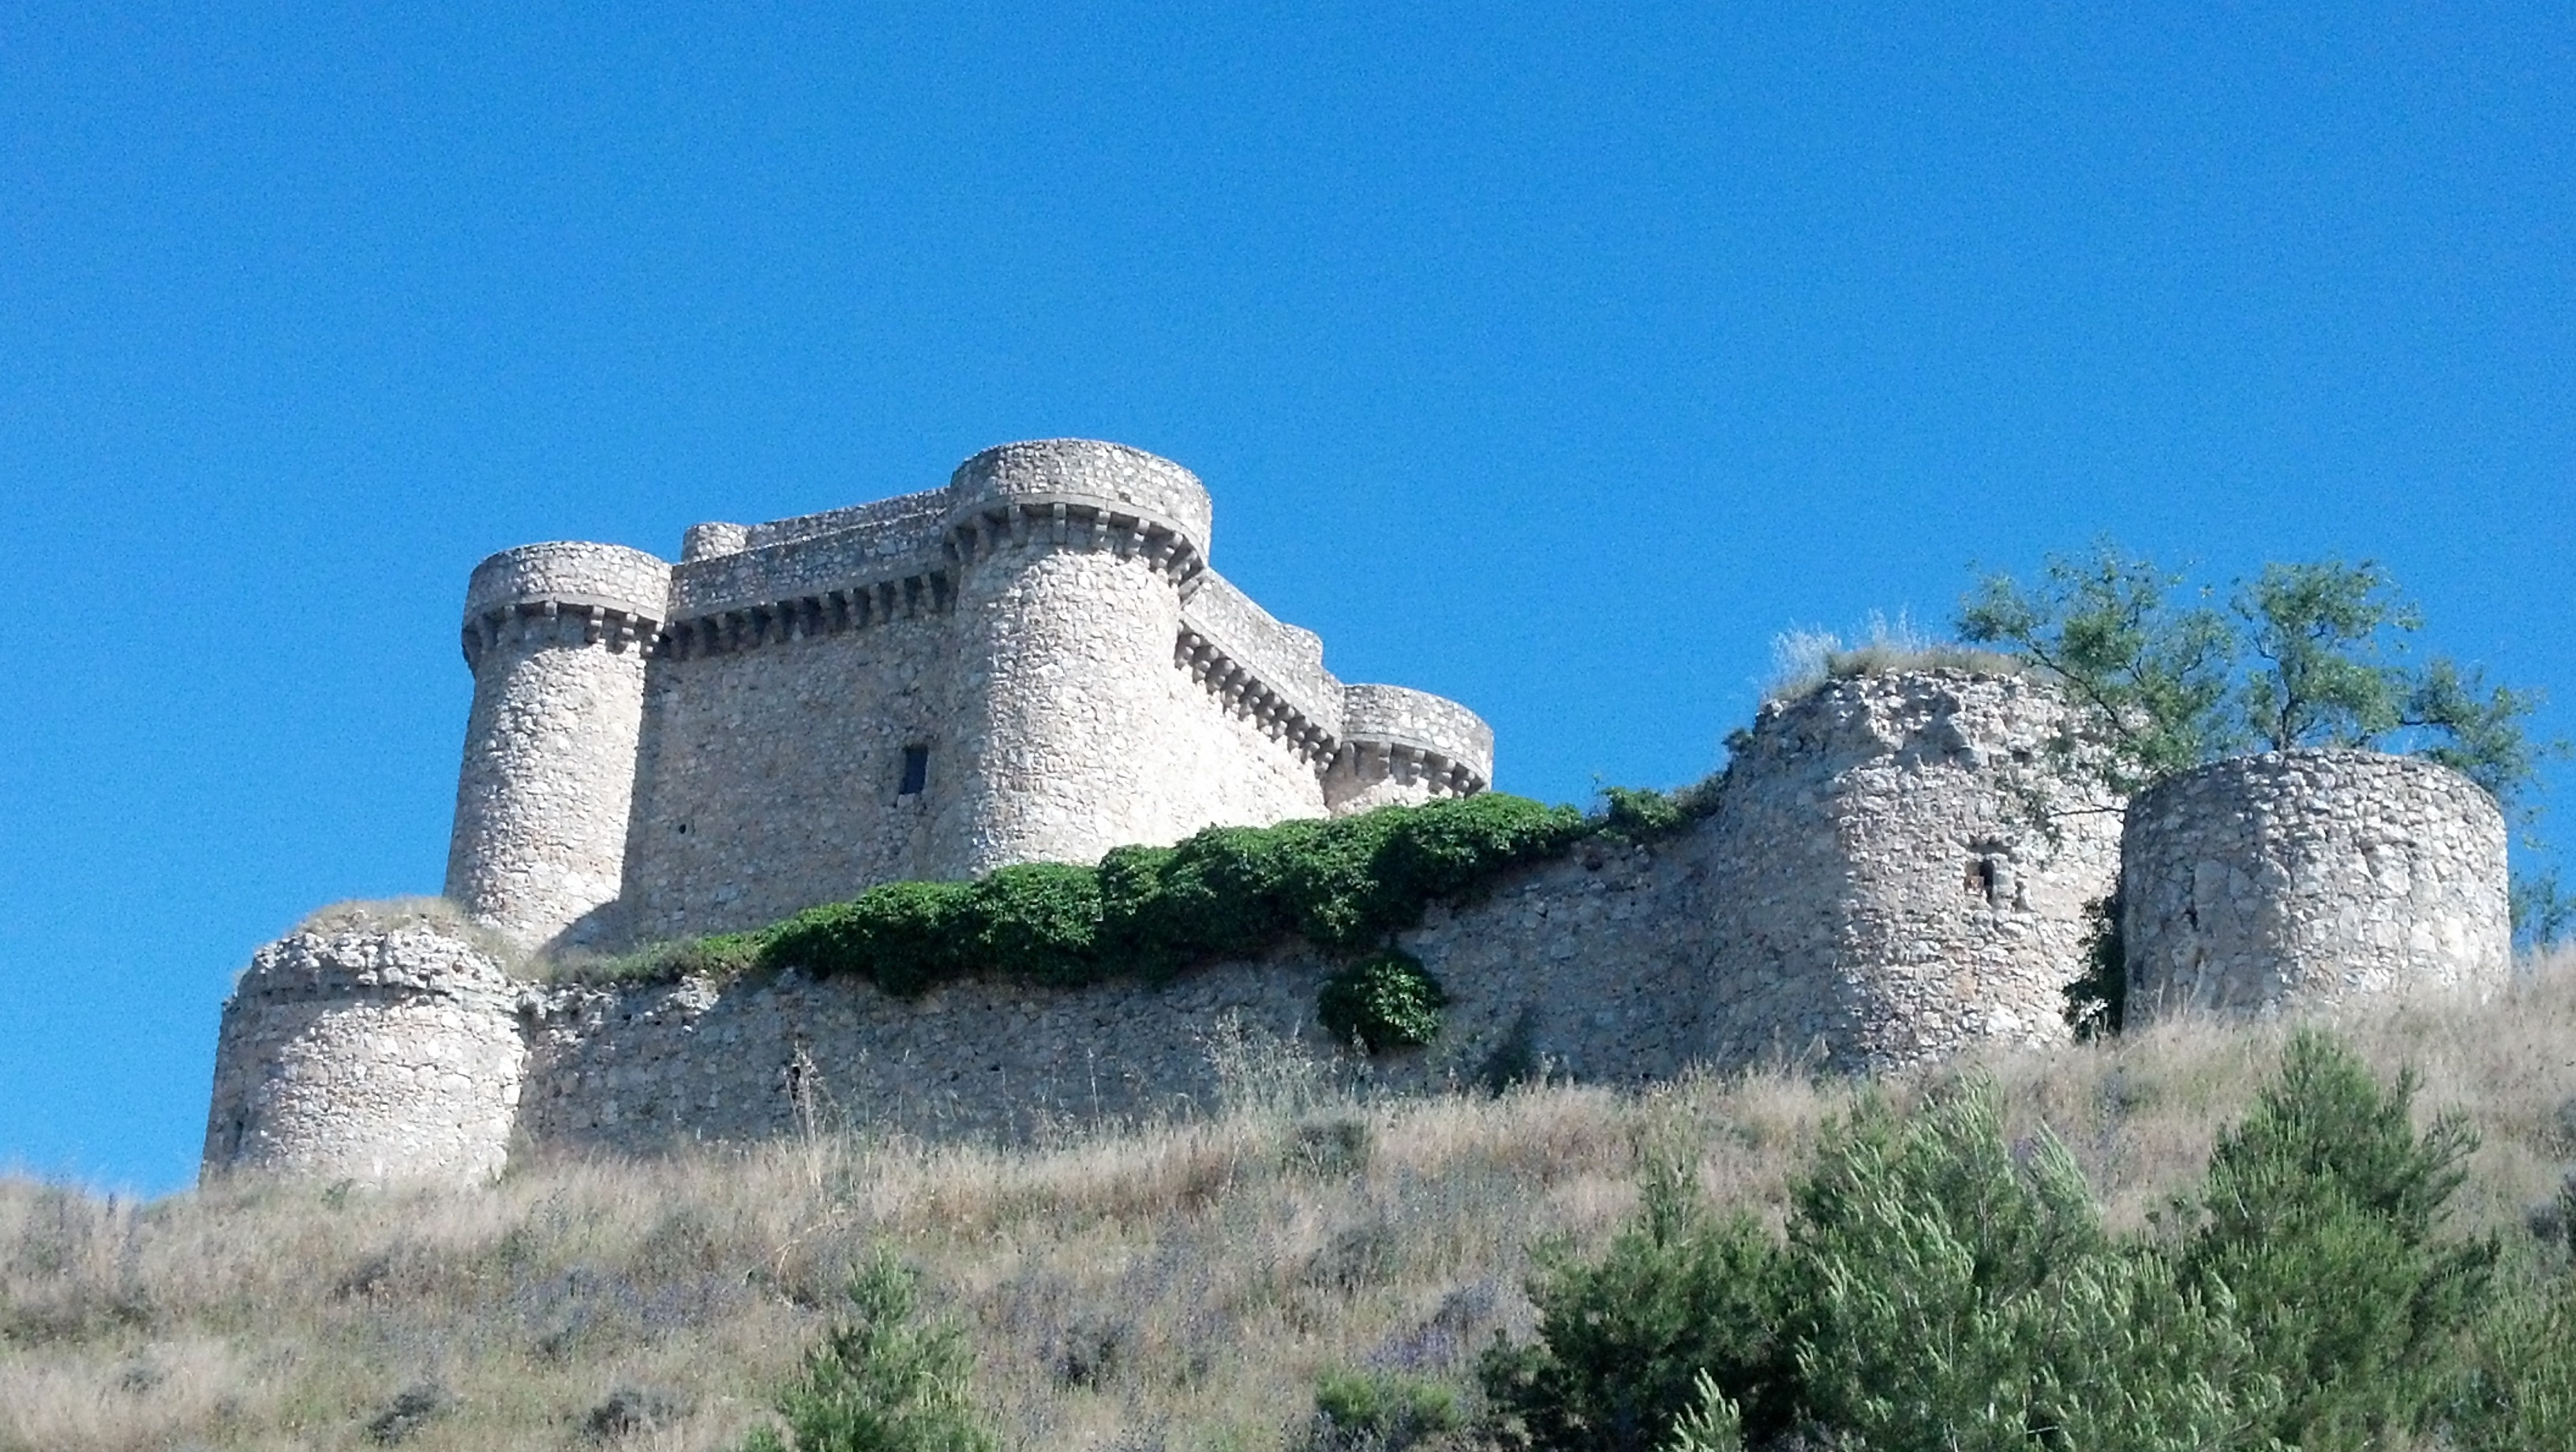 Sesena, Castilla - La Mancha, Spain